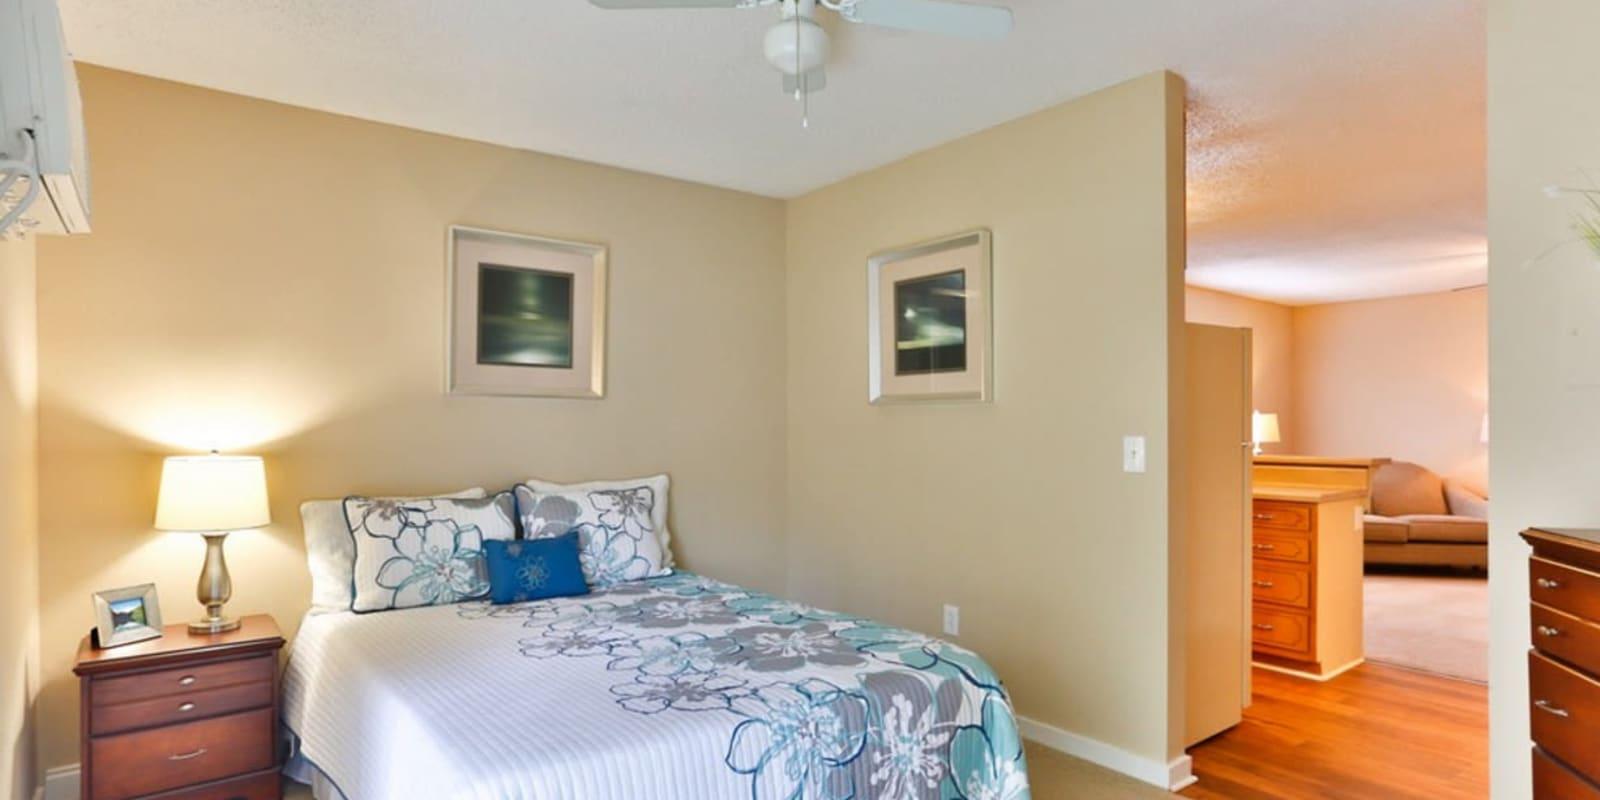 Bedroom with plush carpeting at Huntersville Apartment Homes in Huntersville, North Carolina